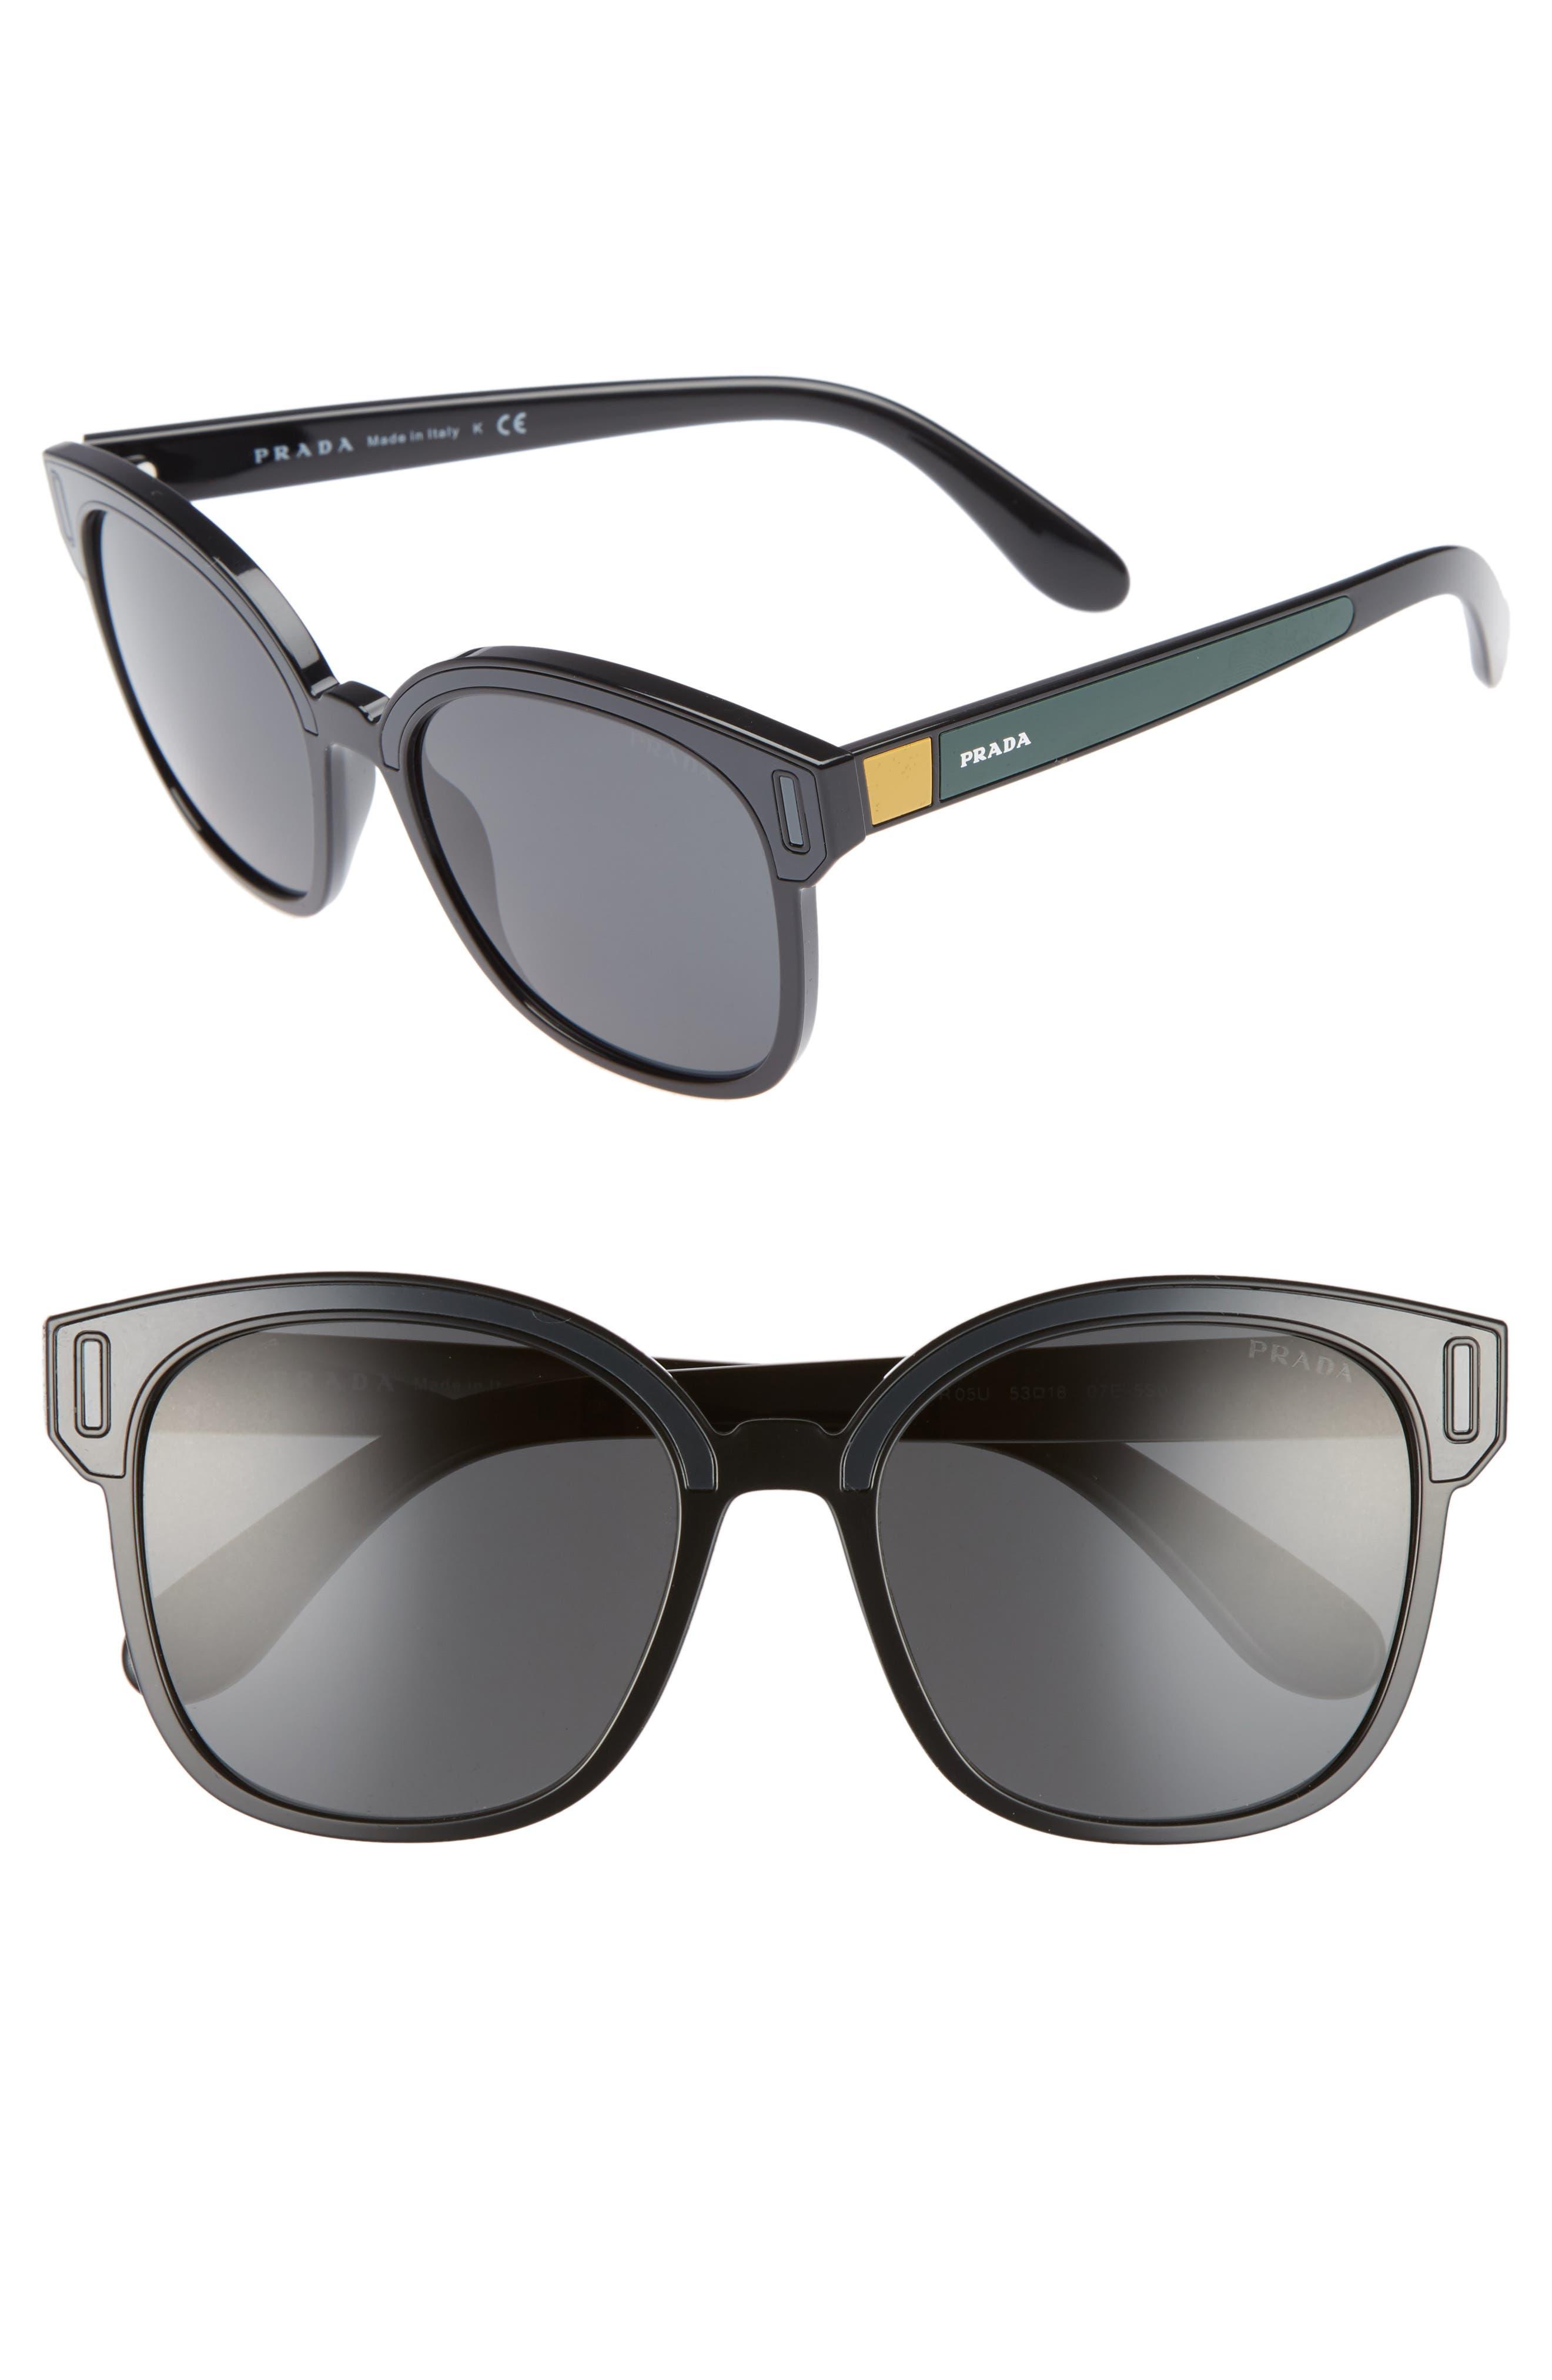 Main Image - Prada 53mm Colorblock Square Sunglasses